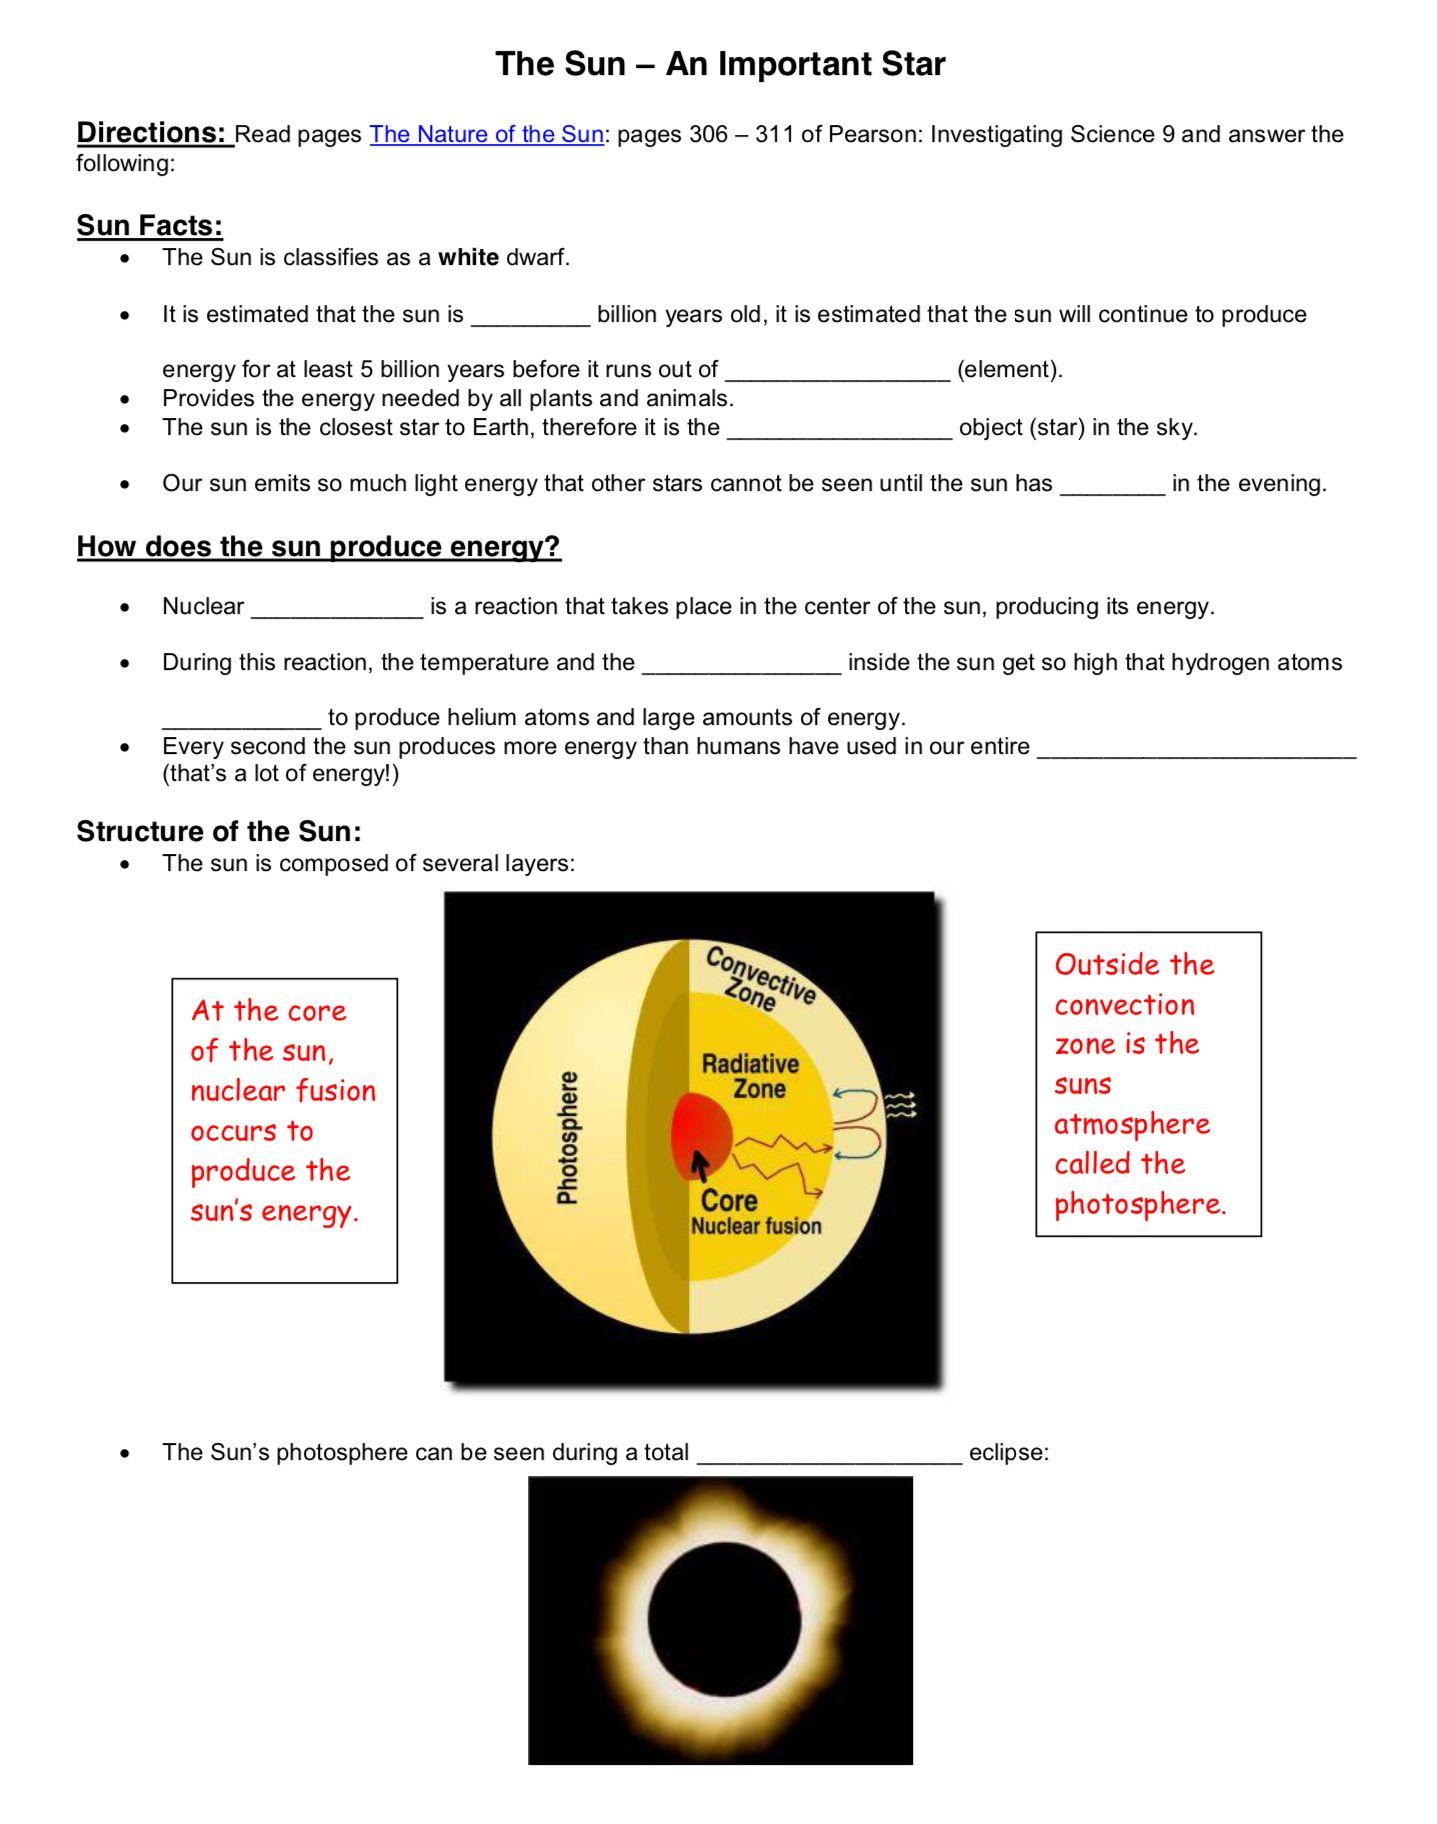 medium resolution of The Sun - An Important Star - Worksheet - Friday